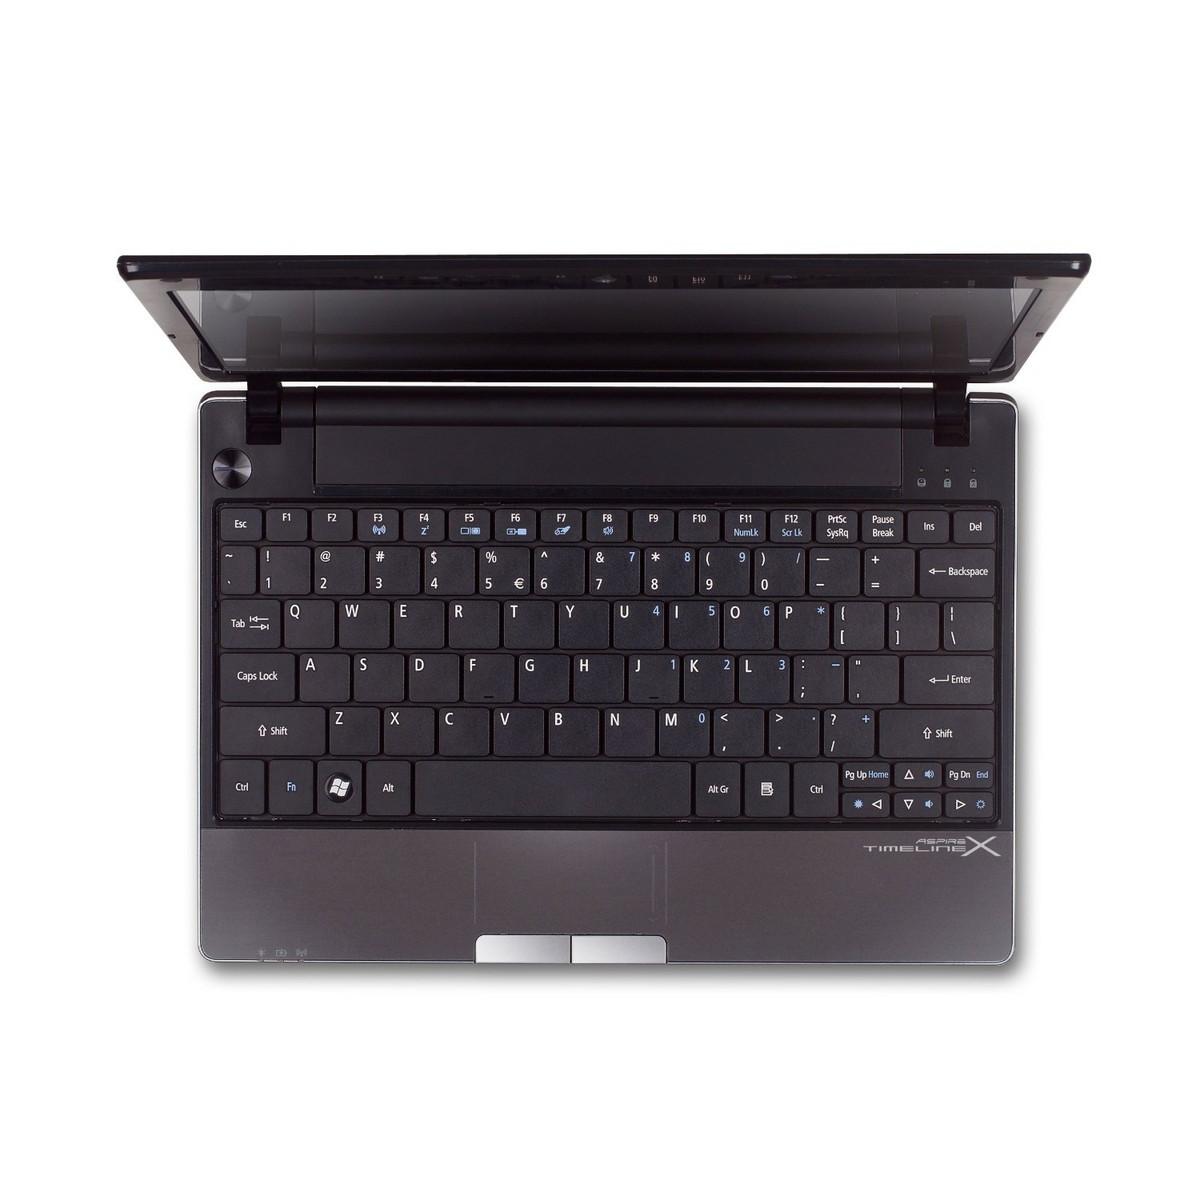 Acer Aspire 1830T Series